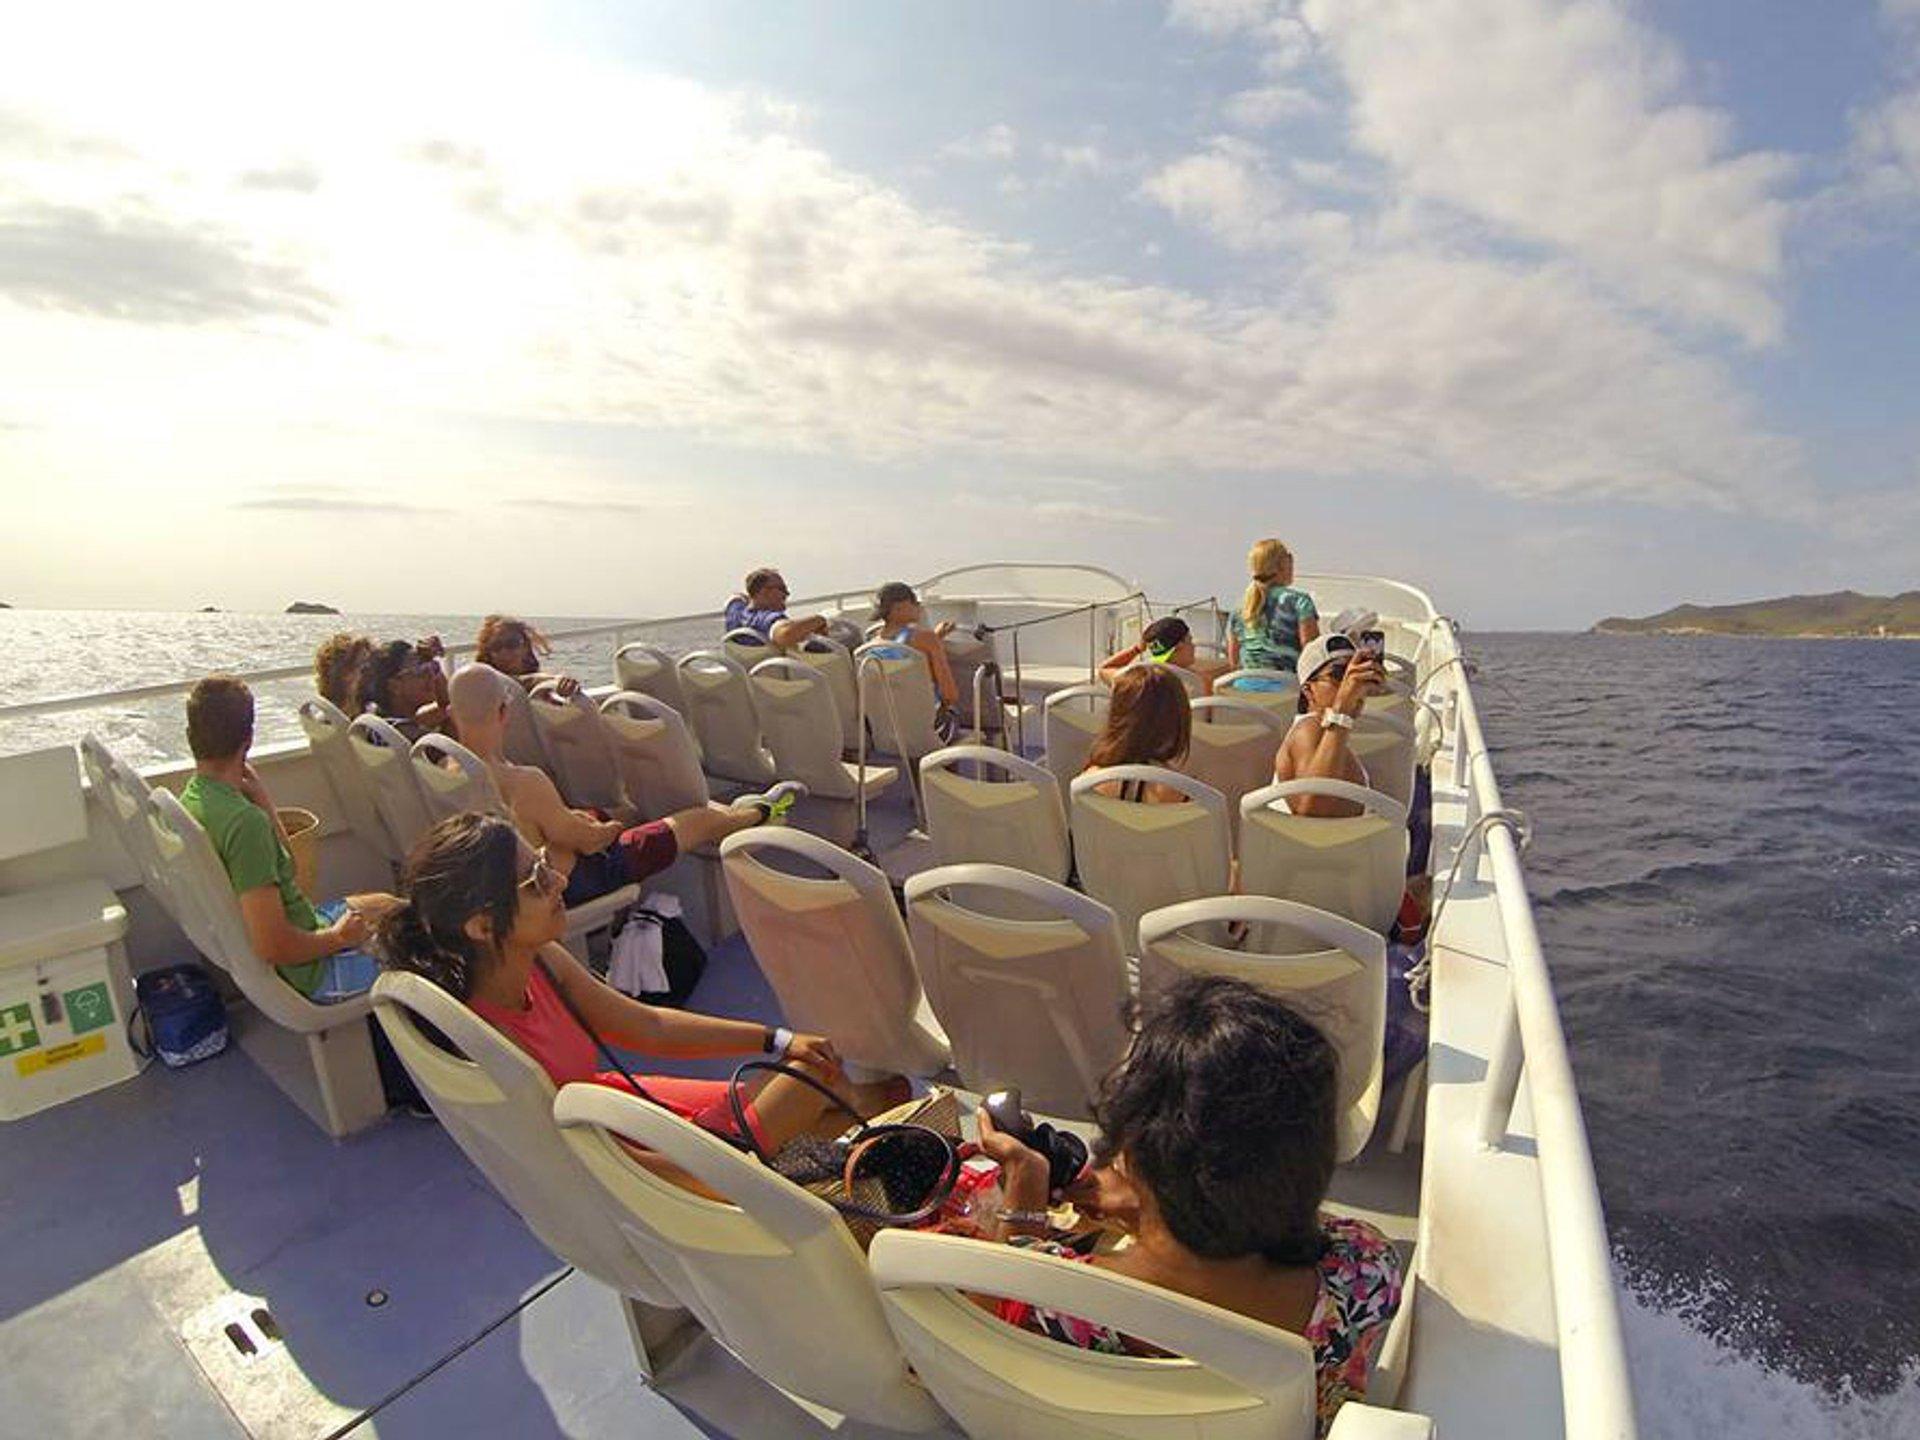 Boat excursion to Es Pujols, Formentera Island, Spain 2020